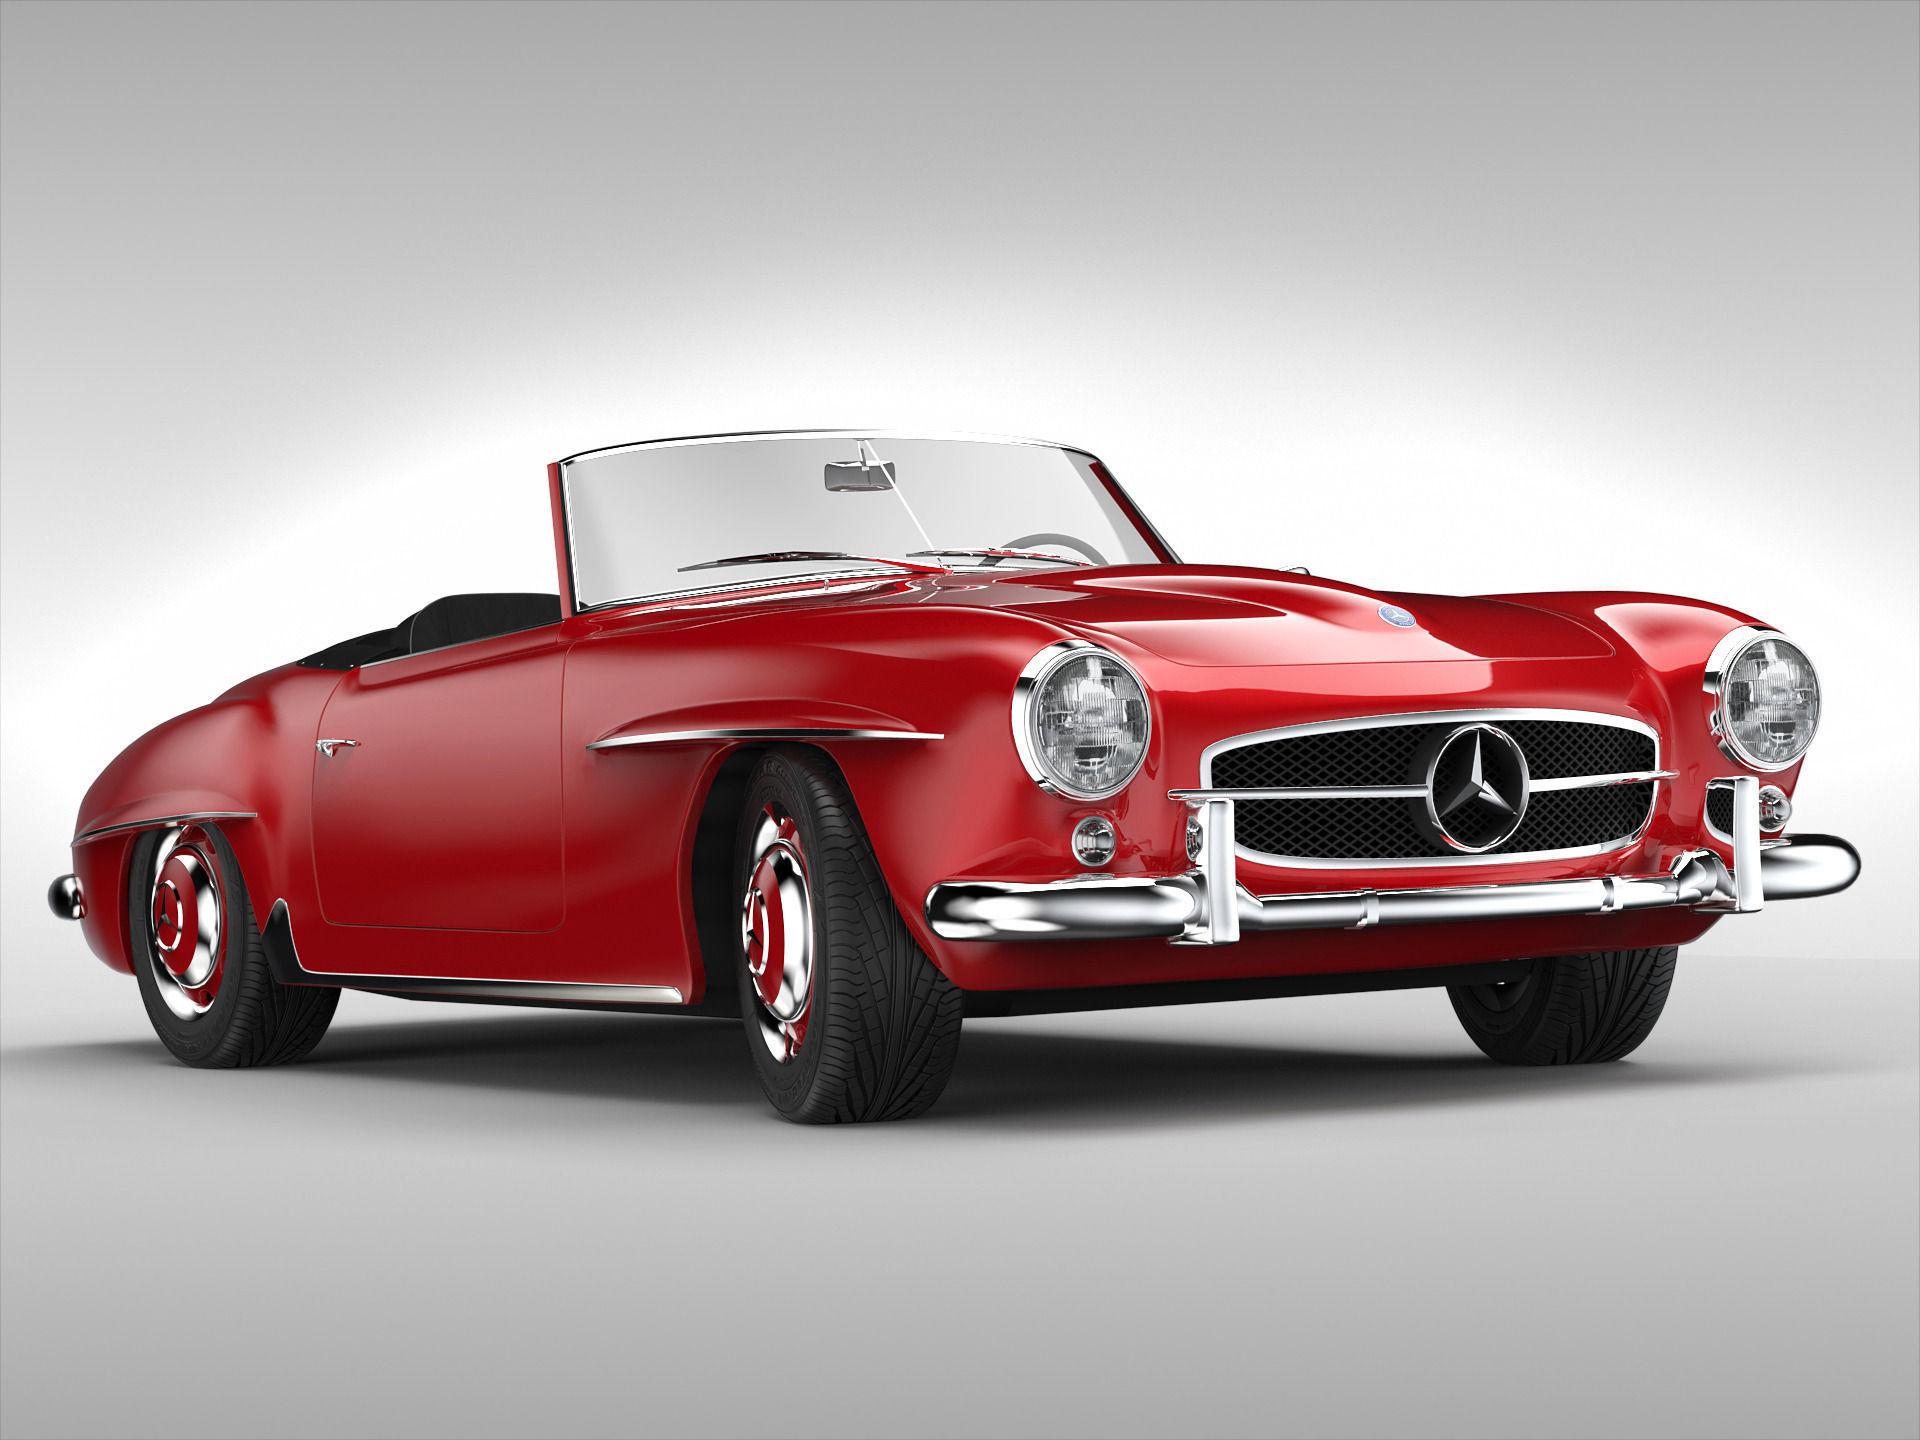 Mercedes-Benz SL-klasse I (R121) 1955 - 1963 Roadster #2